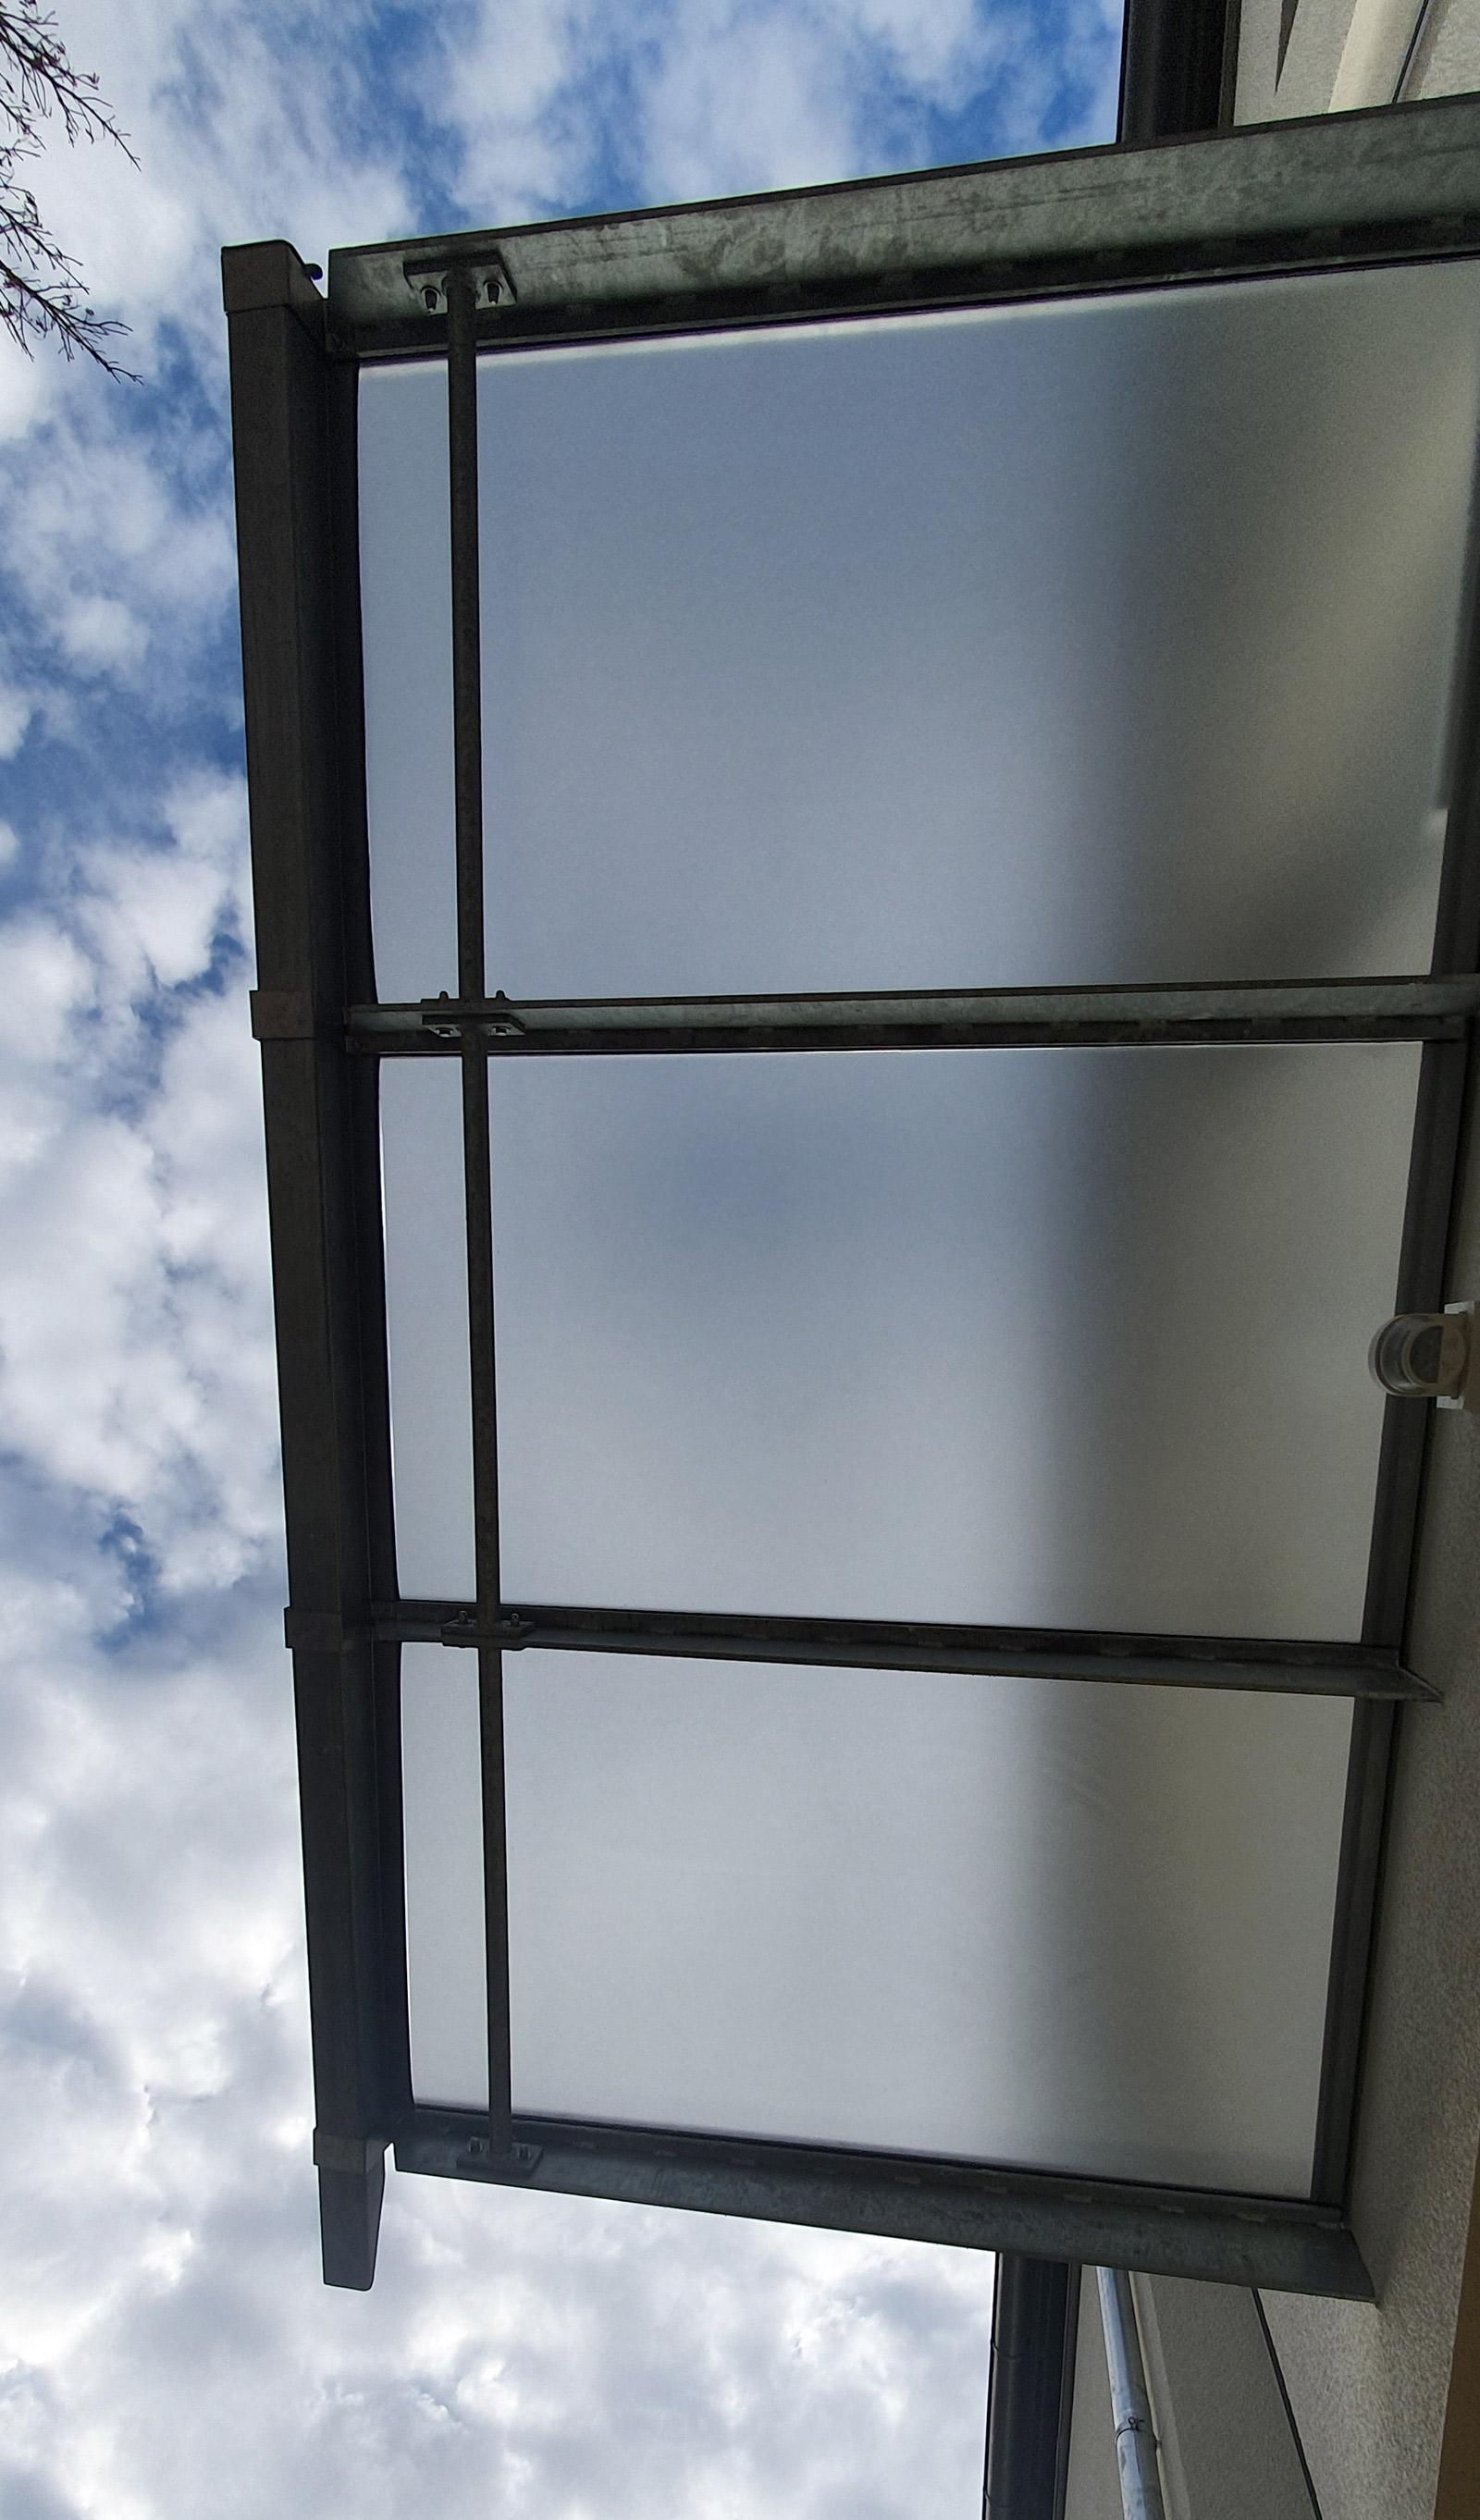 Foliertes Glasdach über Eingang